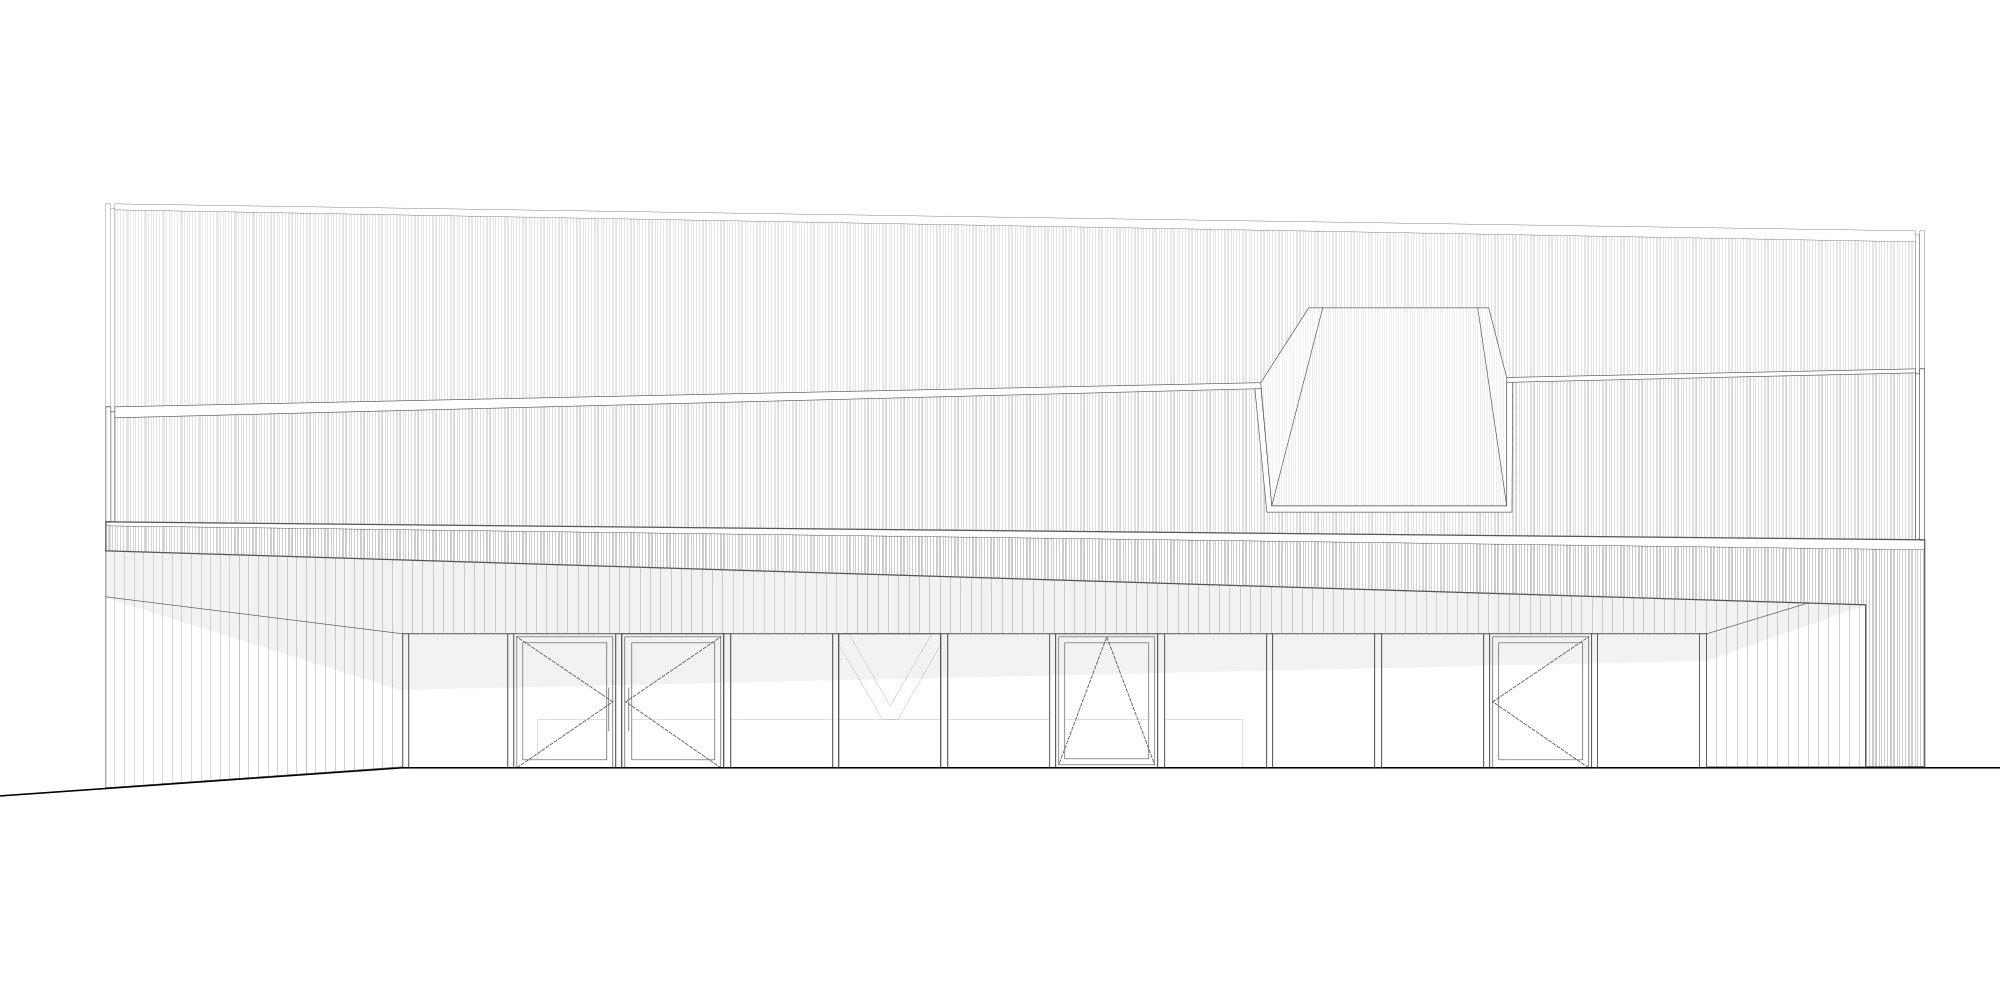 North Elevation © Localarchitecture